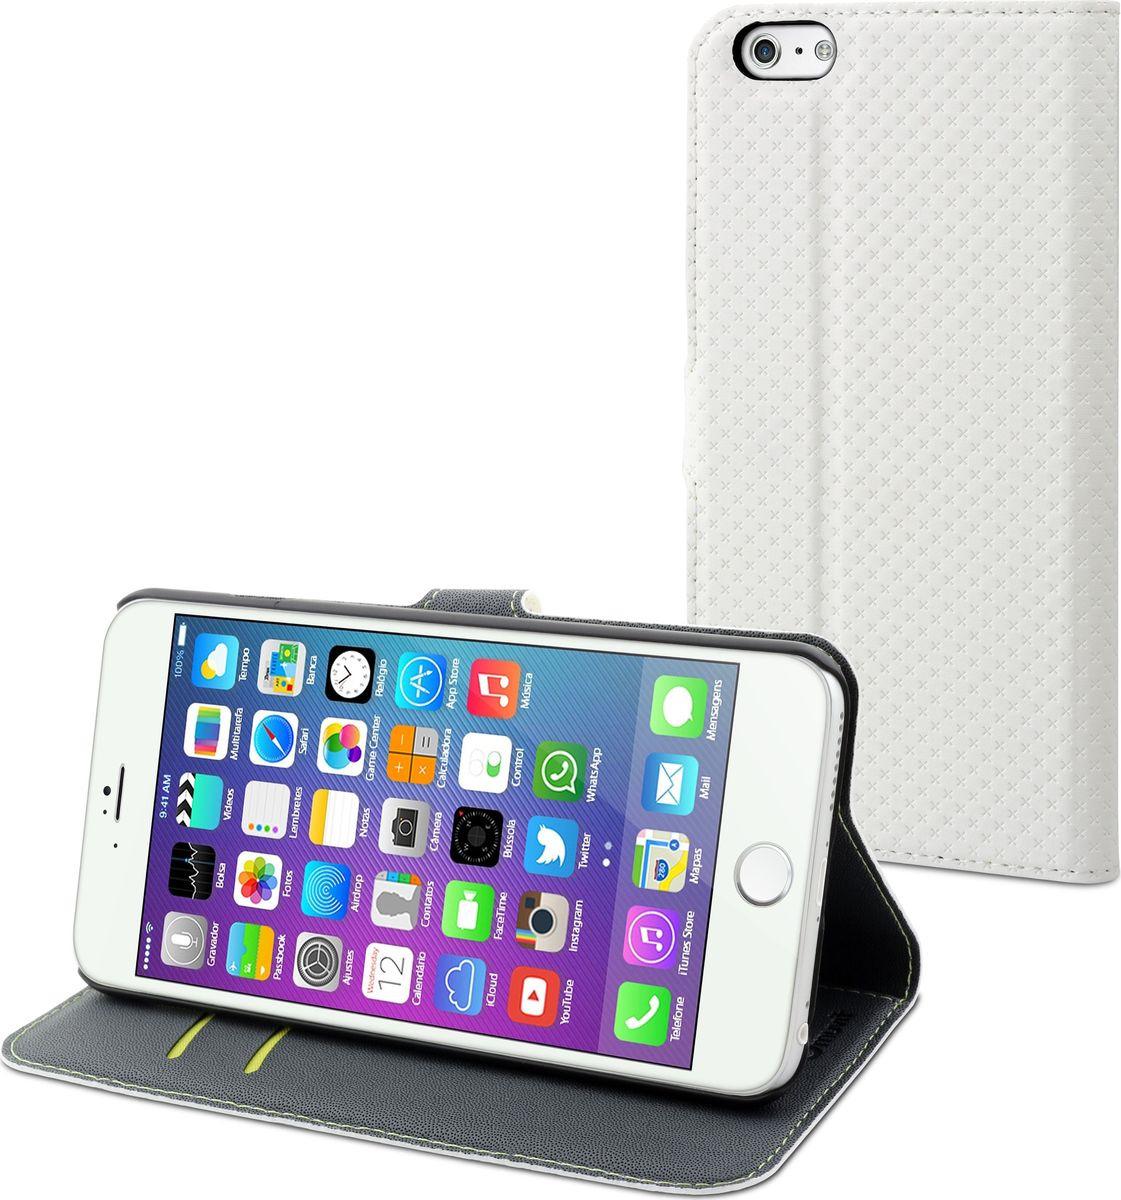 Чехол для сотового телефона Muvit Wallet Folio Stand Case для Apple iPhone 6/6S Plus, MUSNS0078, белый цена